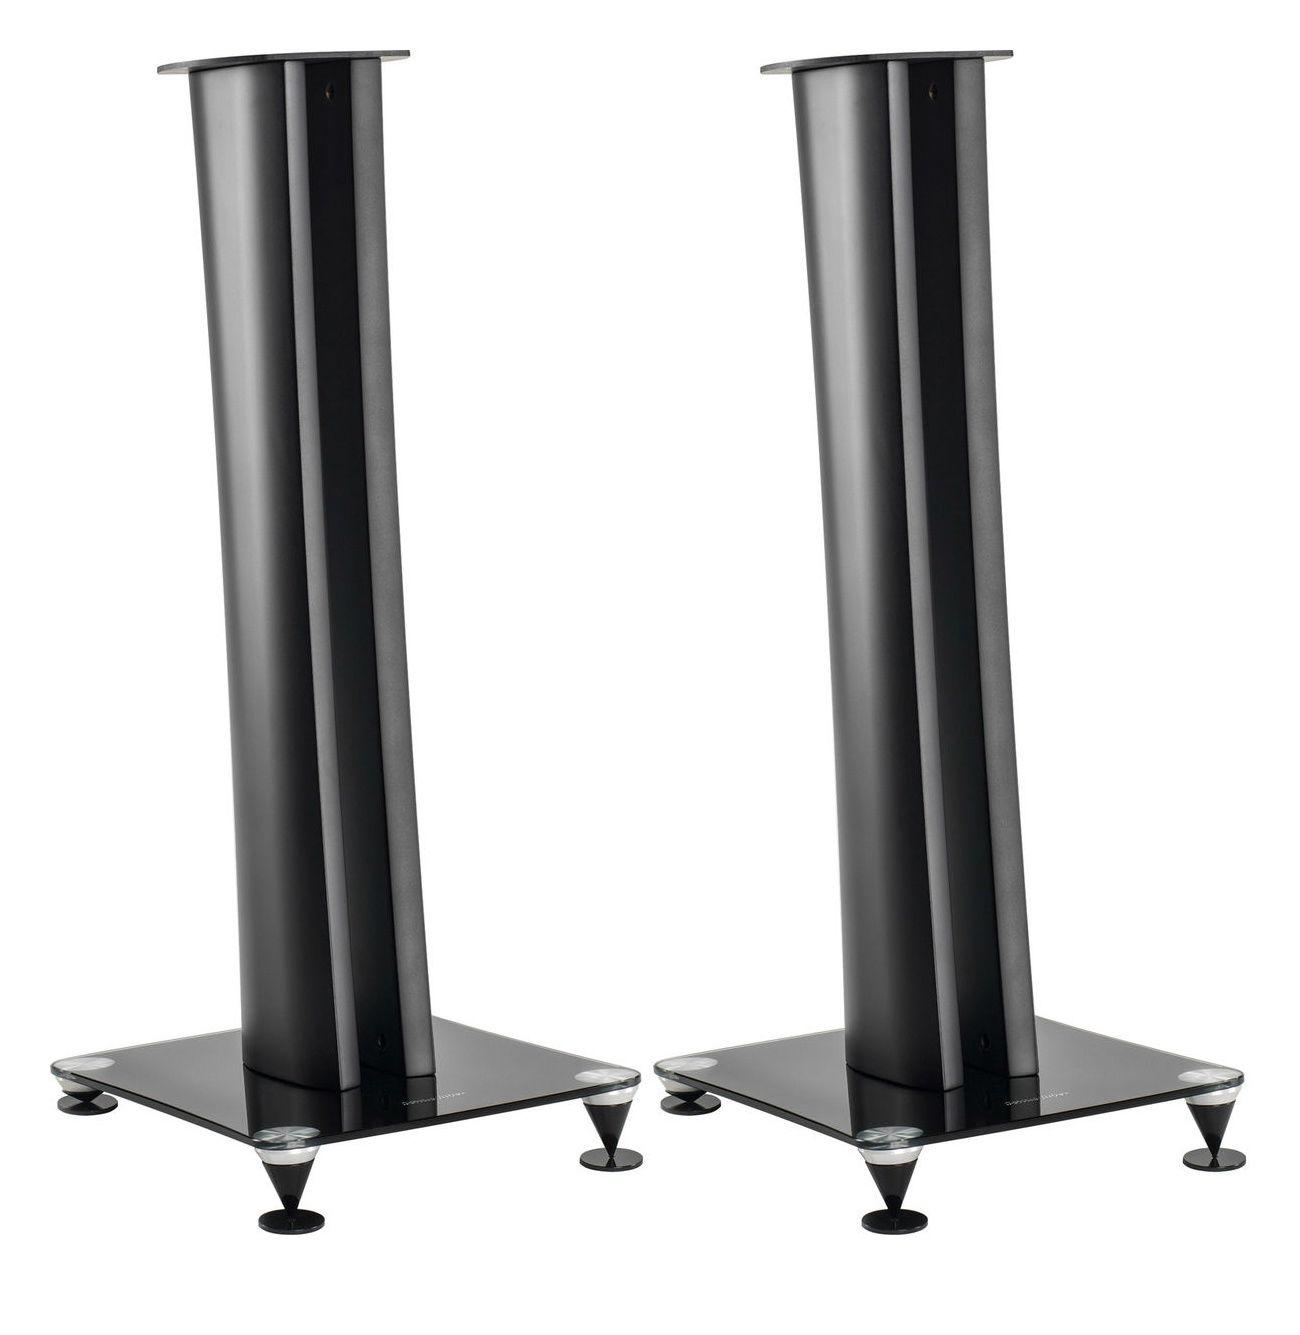 Sonus Faber Venere 1 5 2 0 Speaker Stands Black Ssi